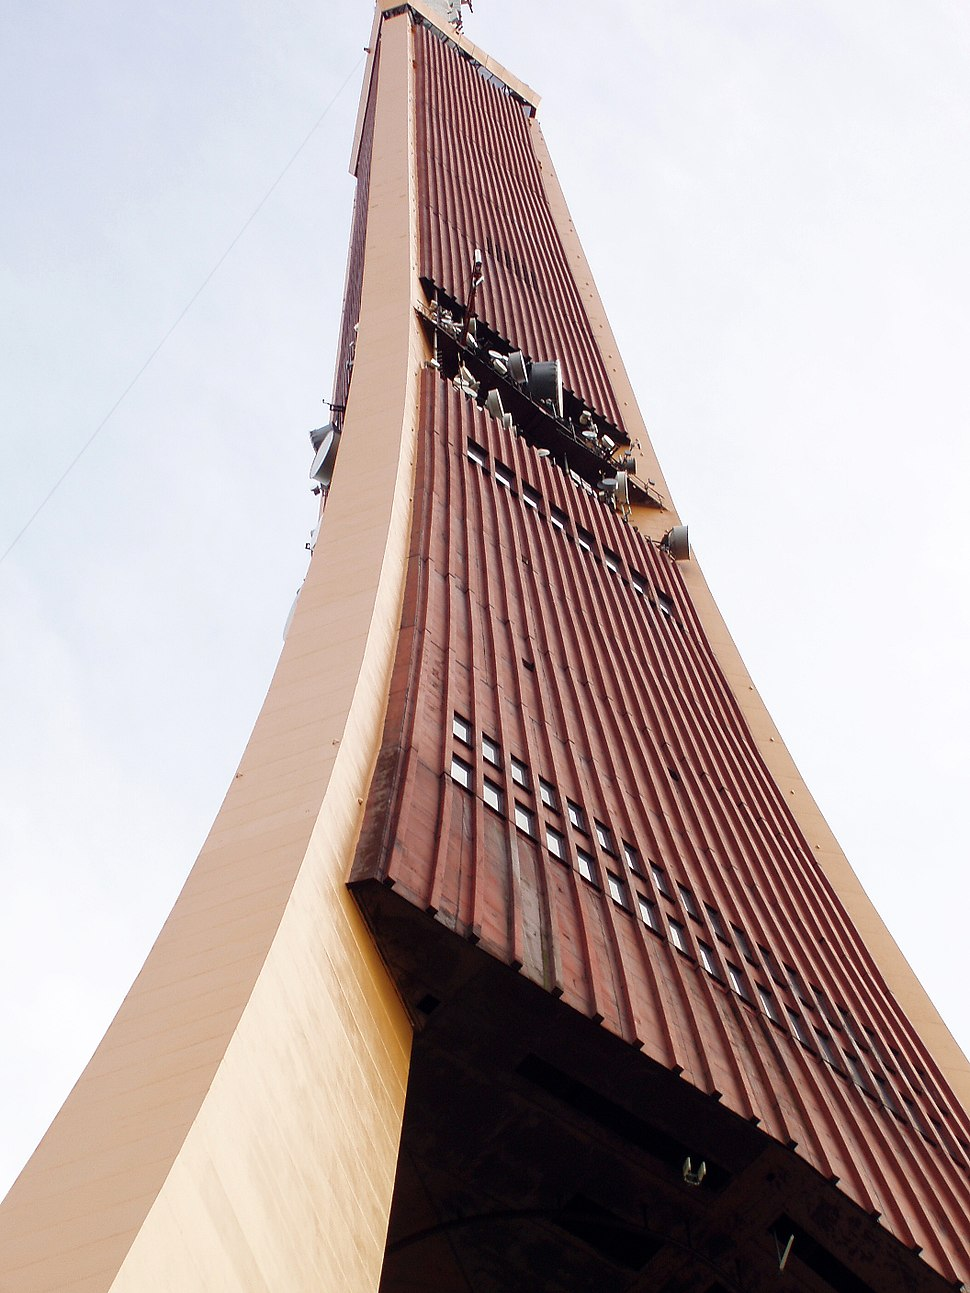 Rīgas televīzijas tornis 06.2005